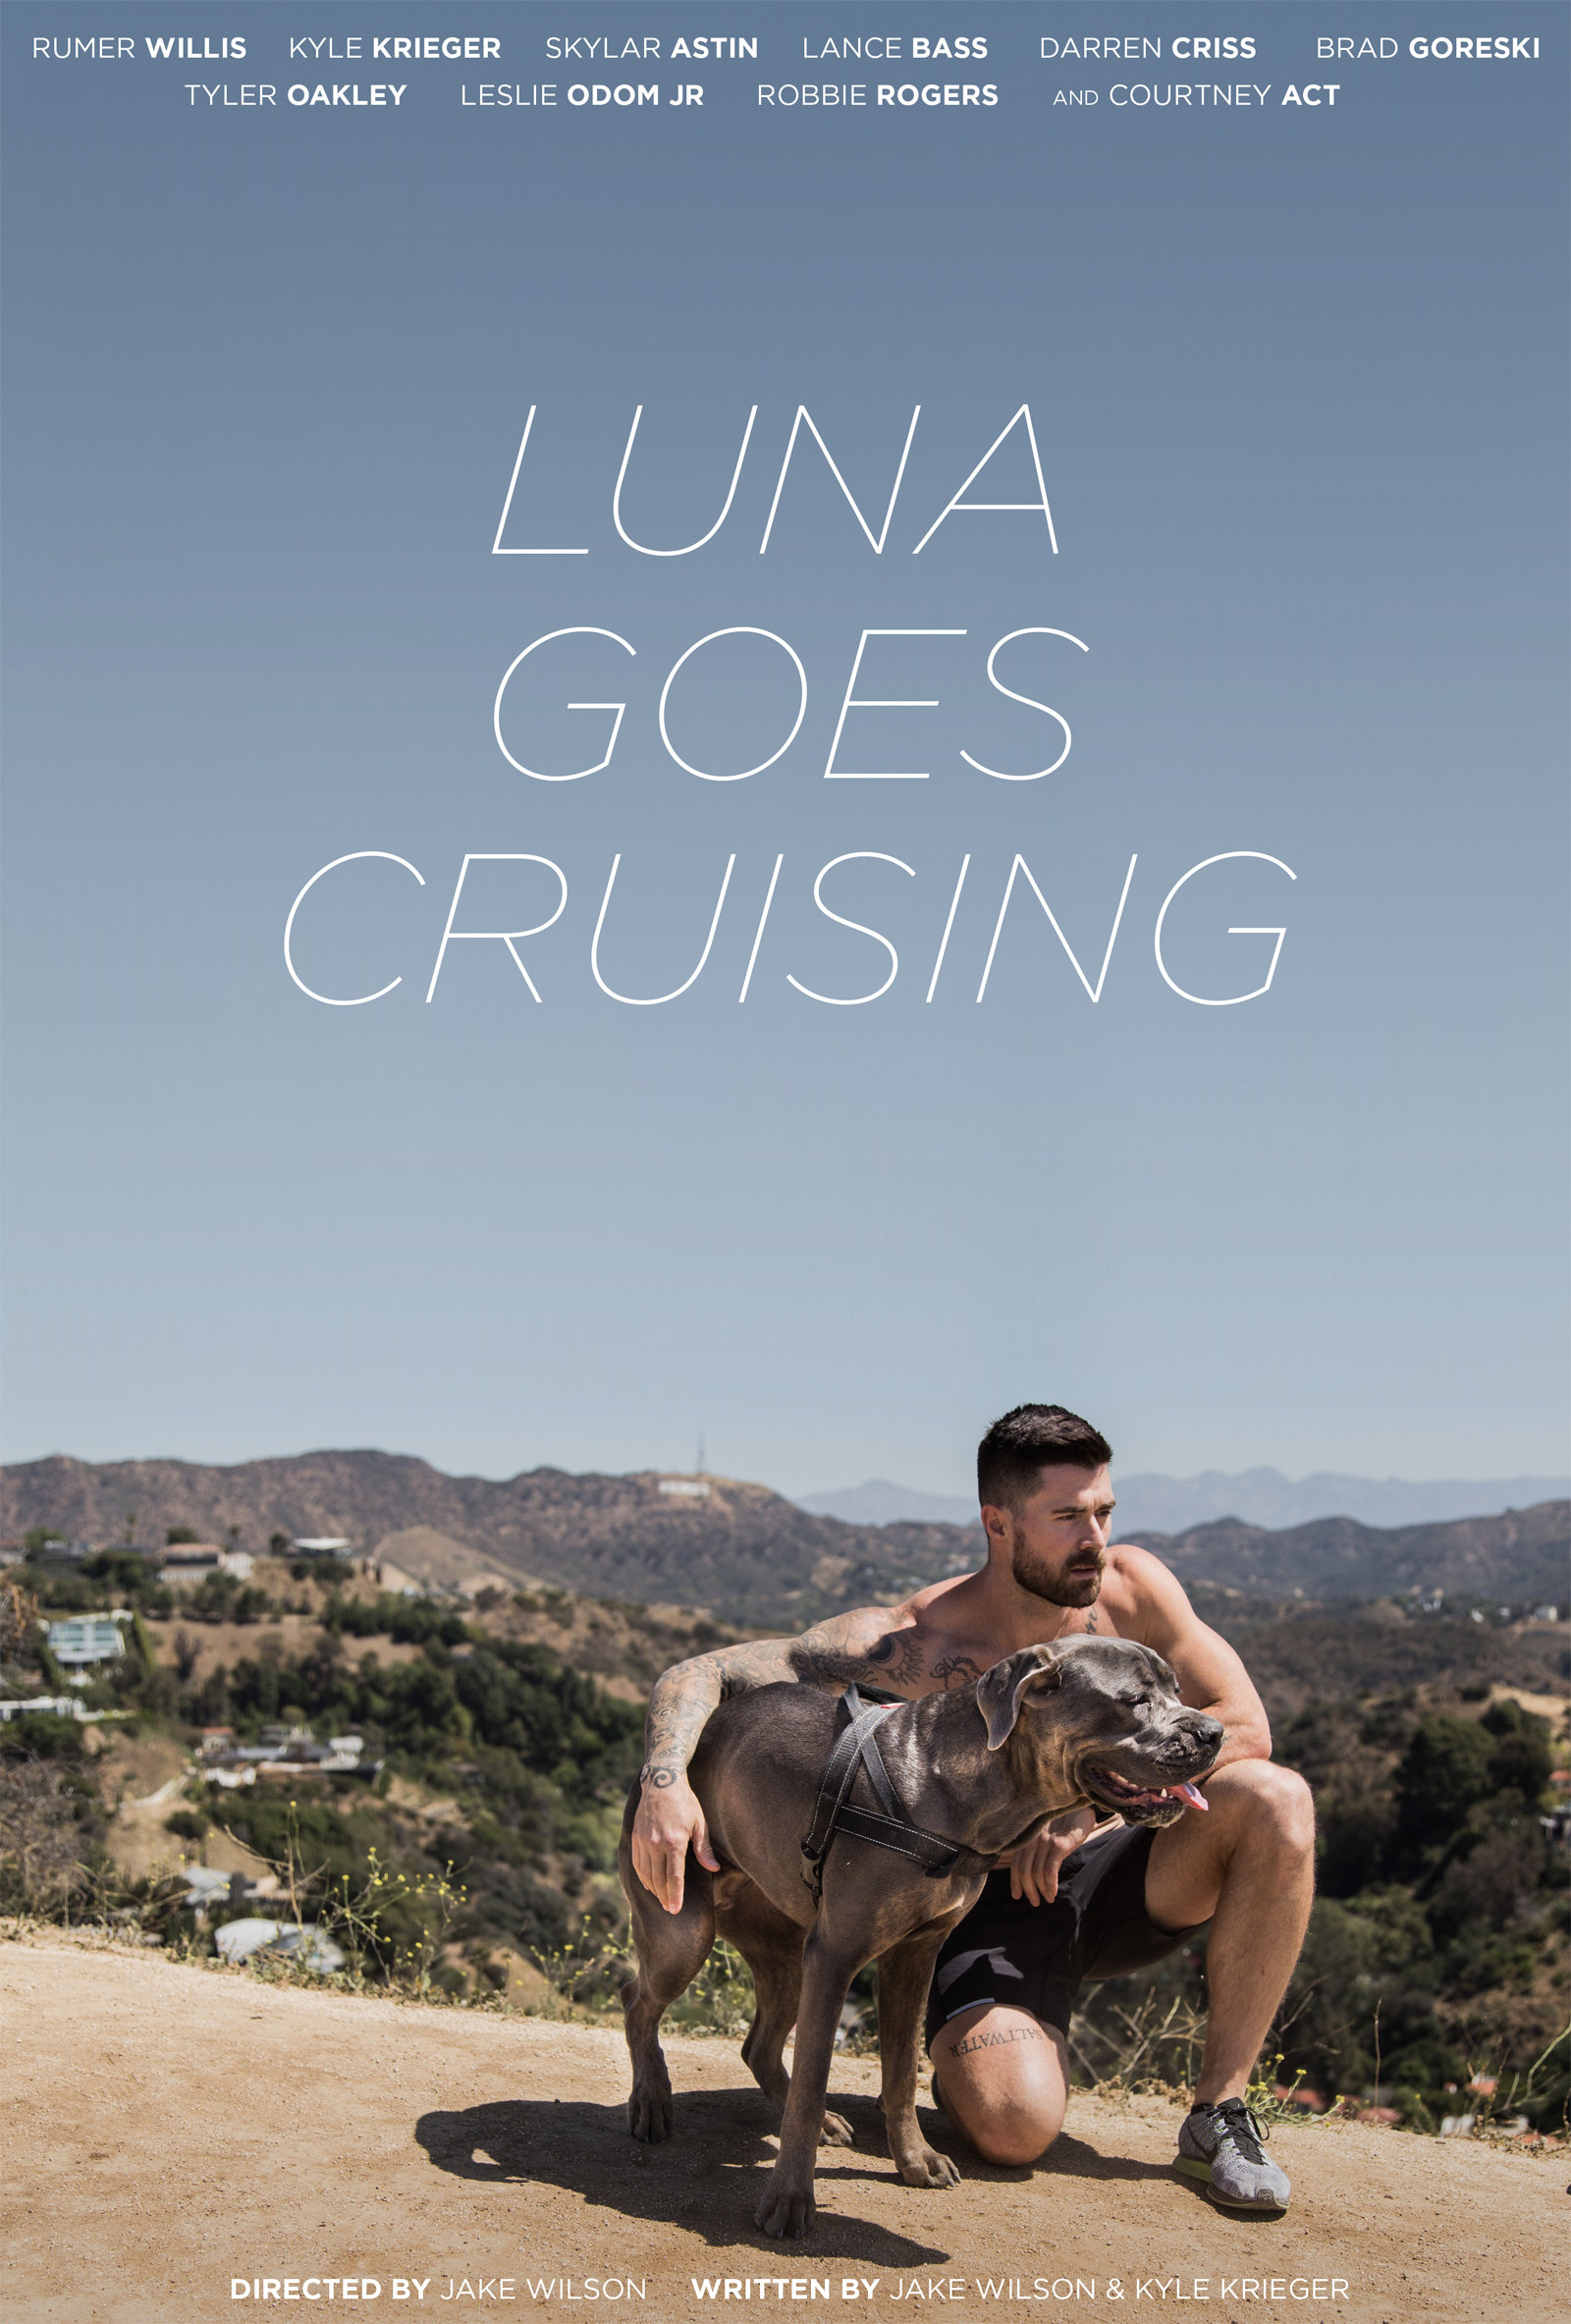 Kyle Krieger in Luna Goes Cruising (2015)